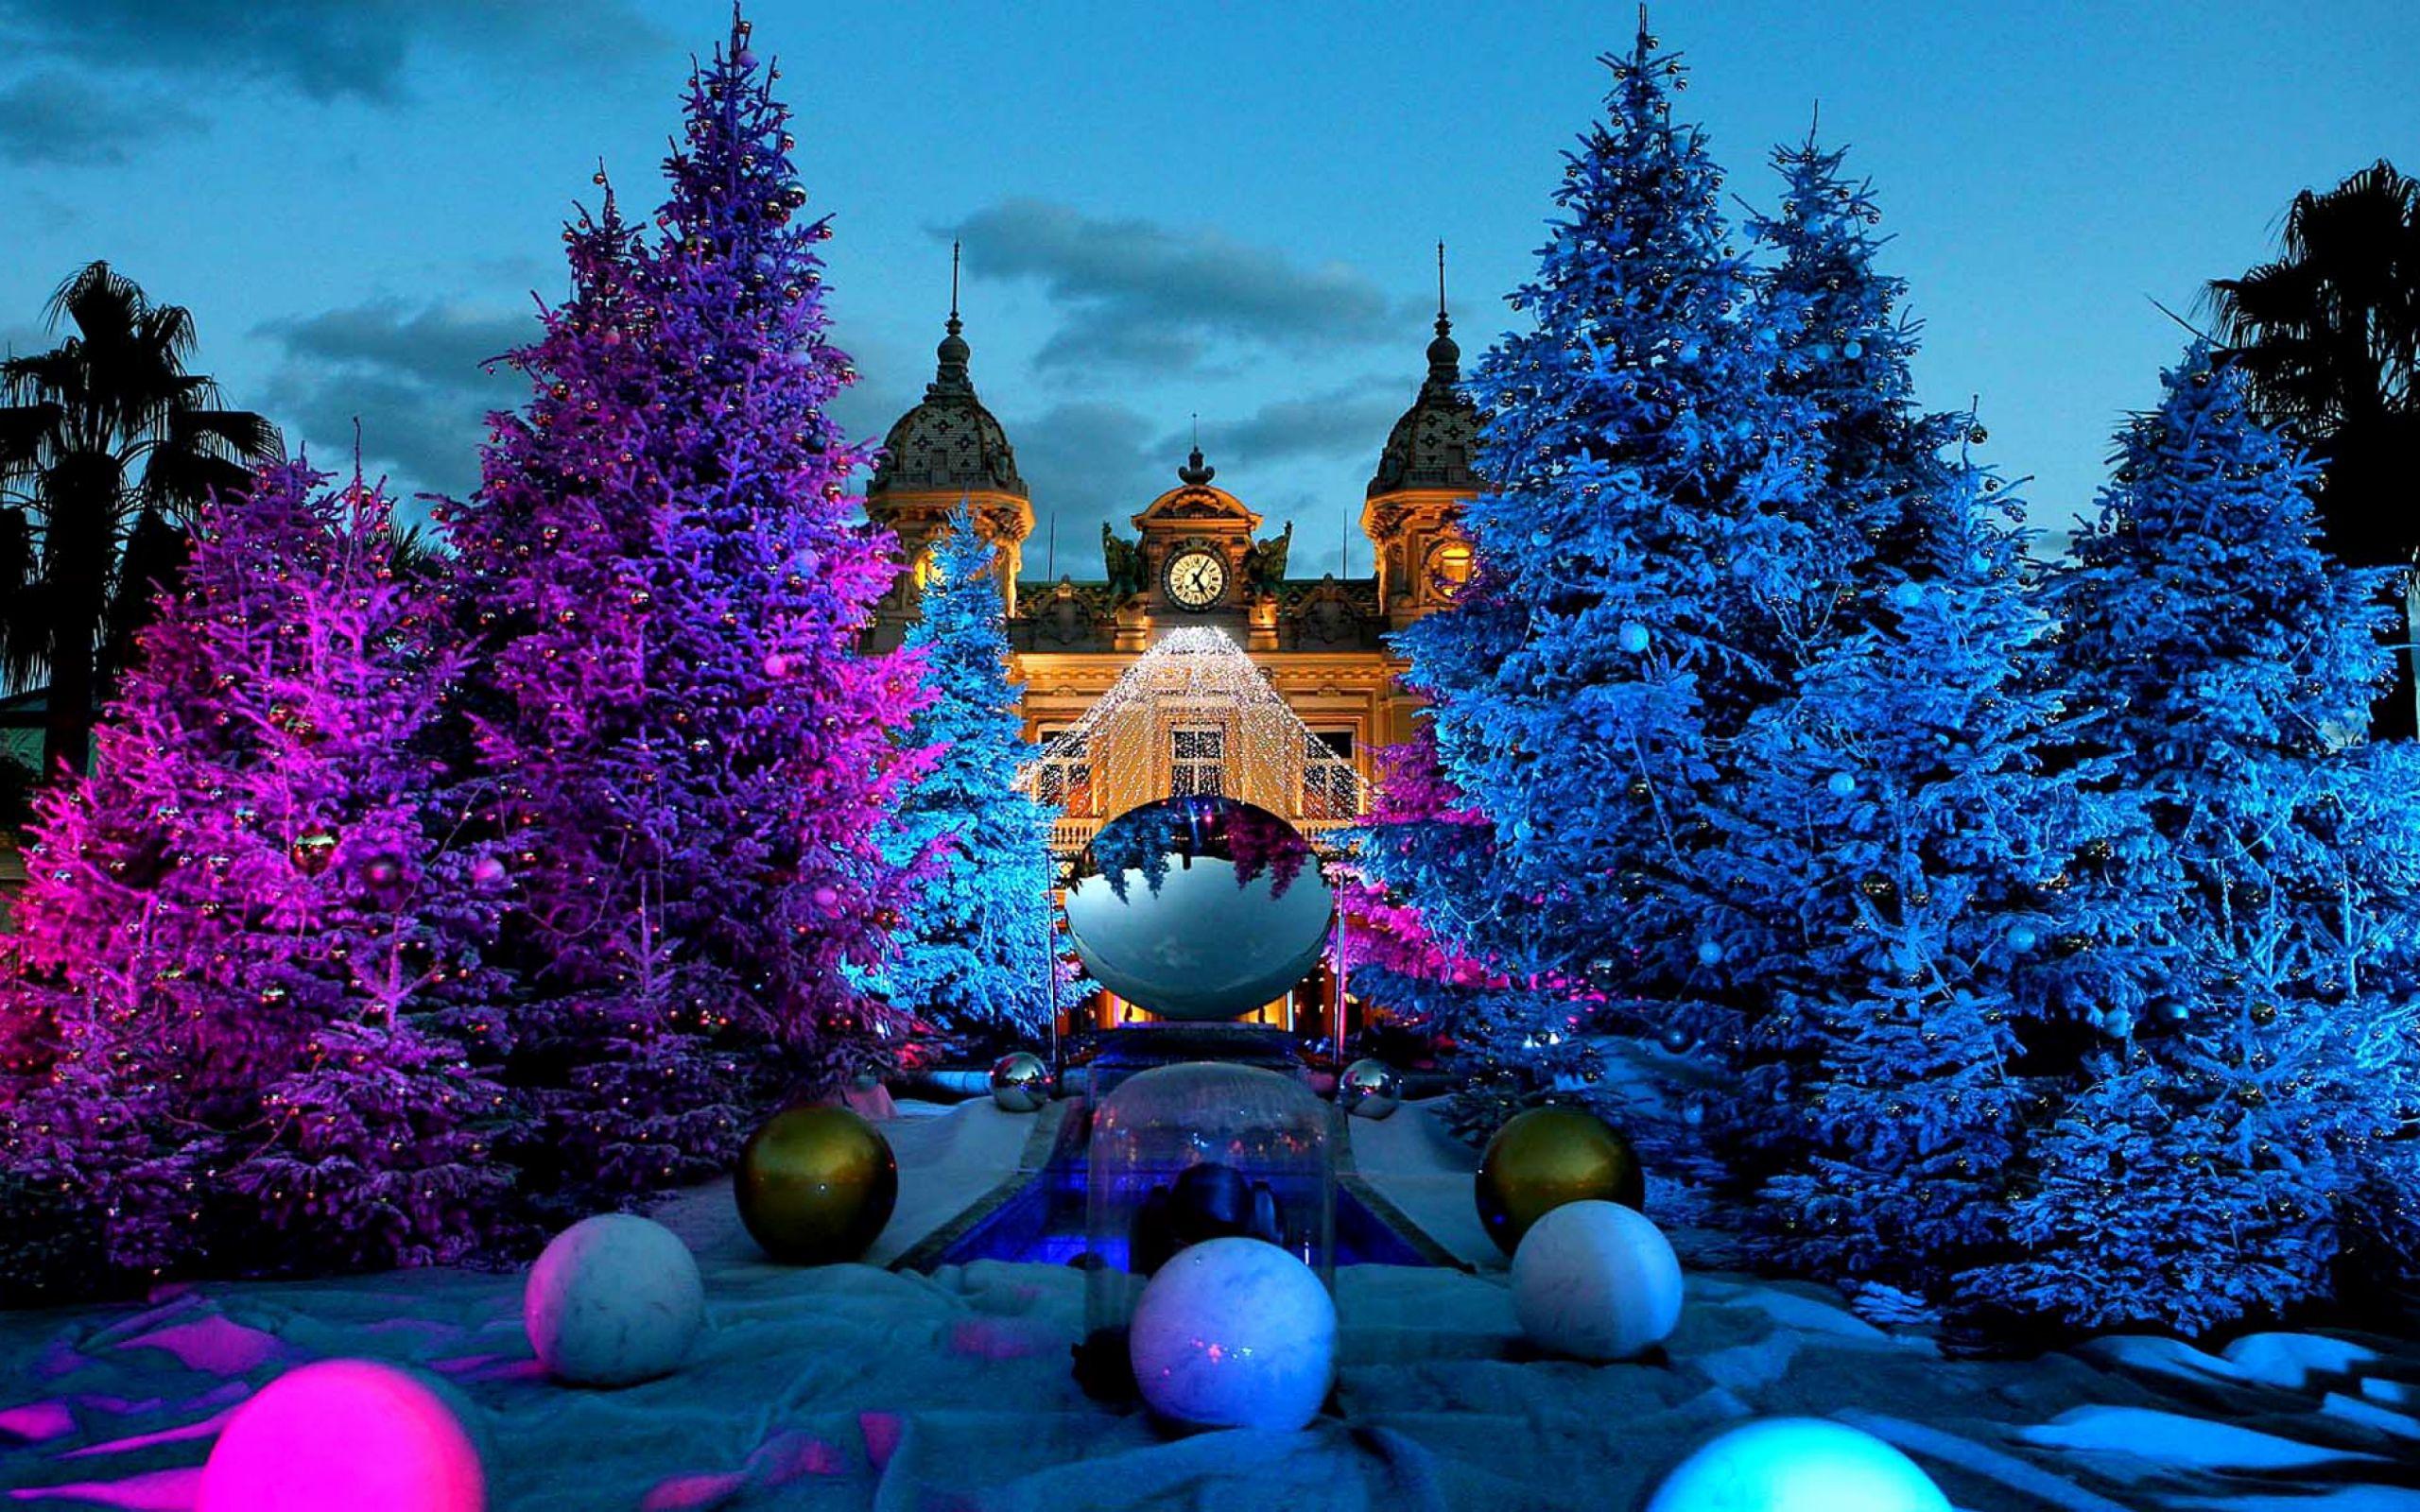 4k wallpaper,blue,christmas tree,tree,purple,majorelle blue